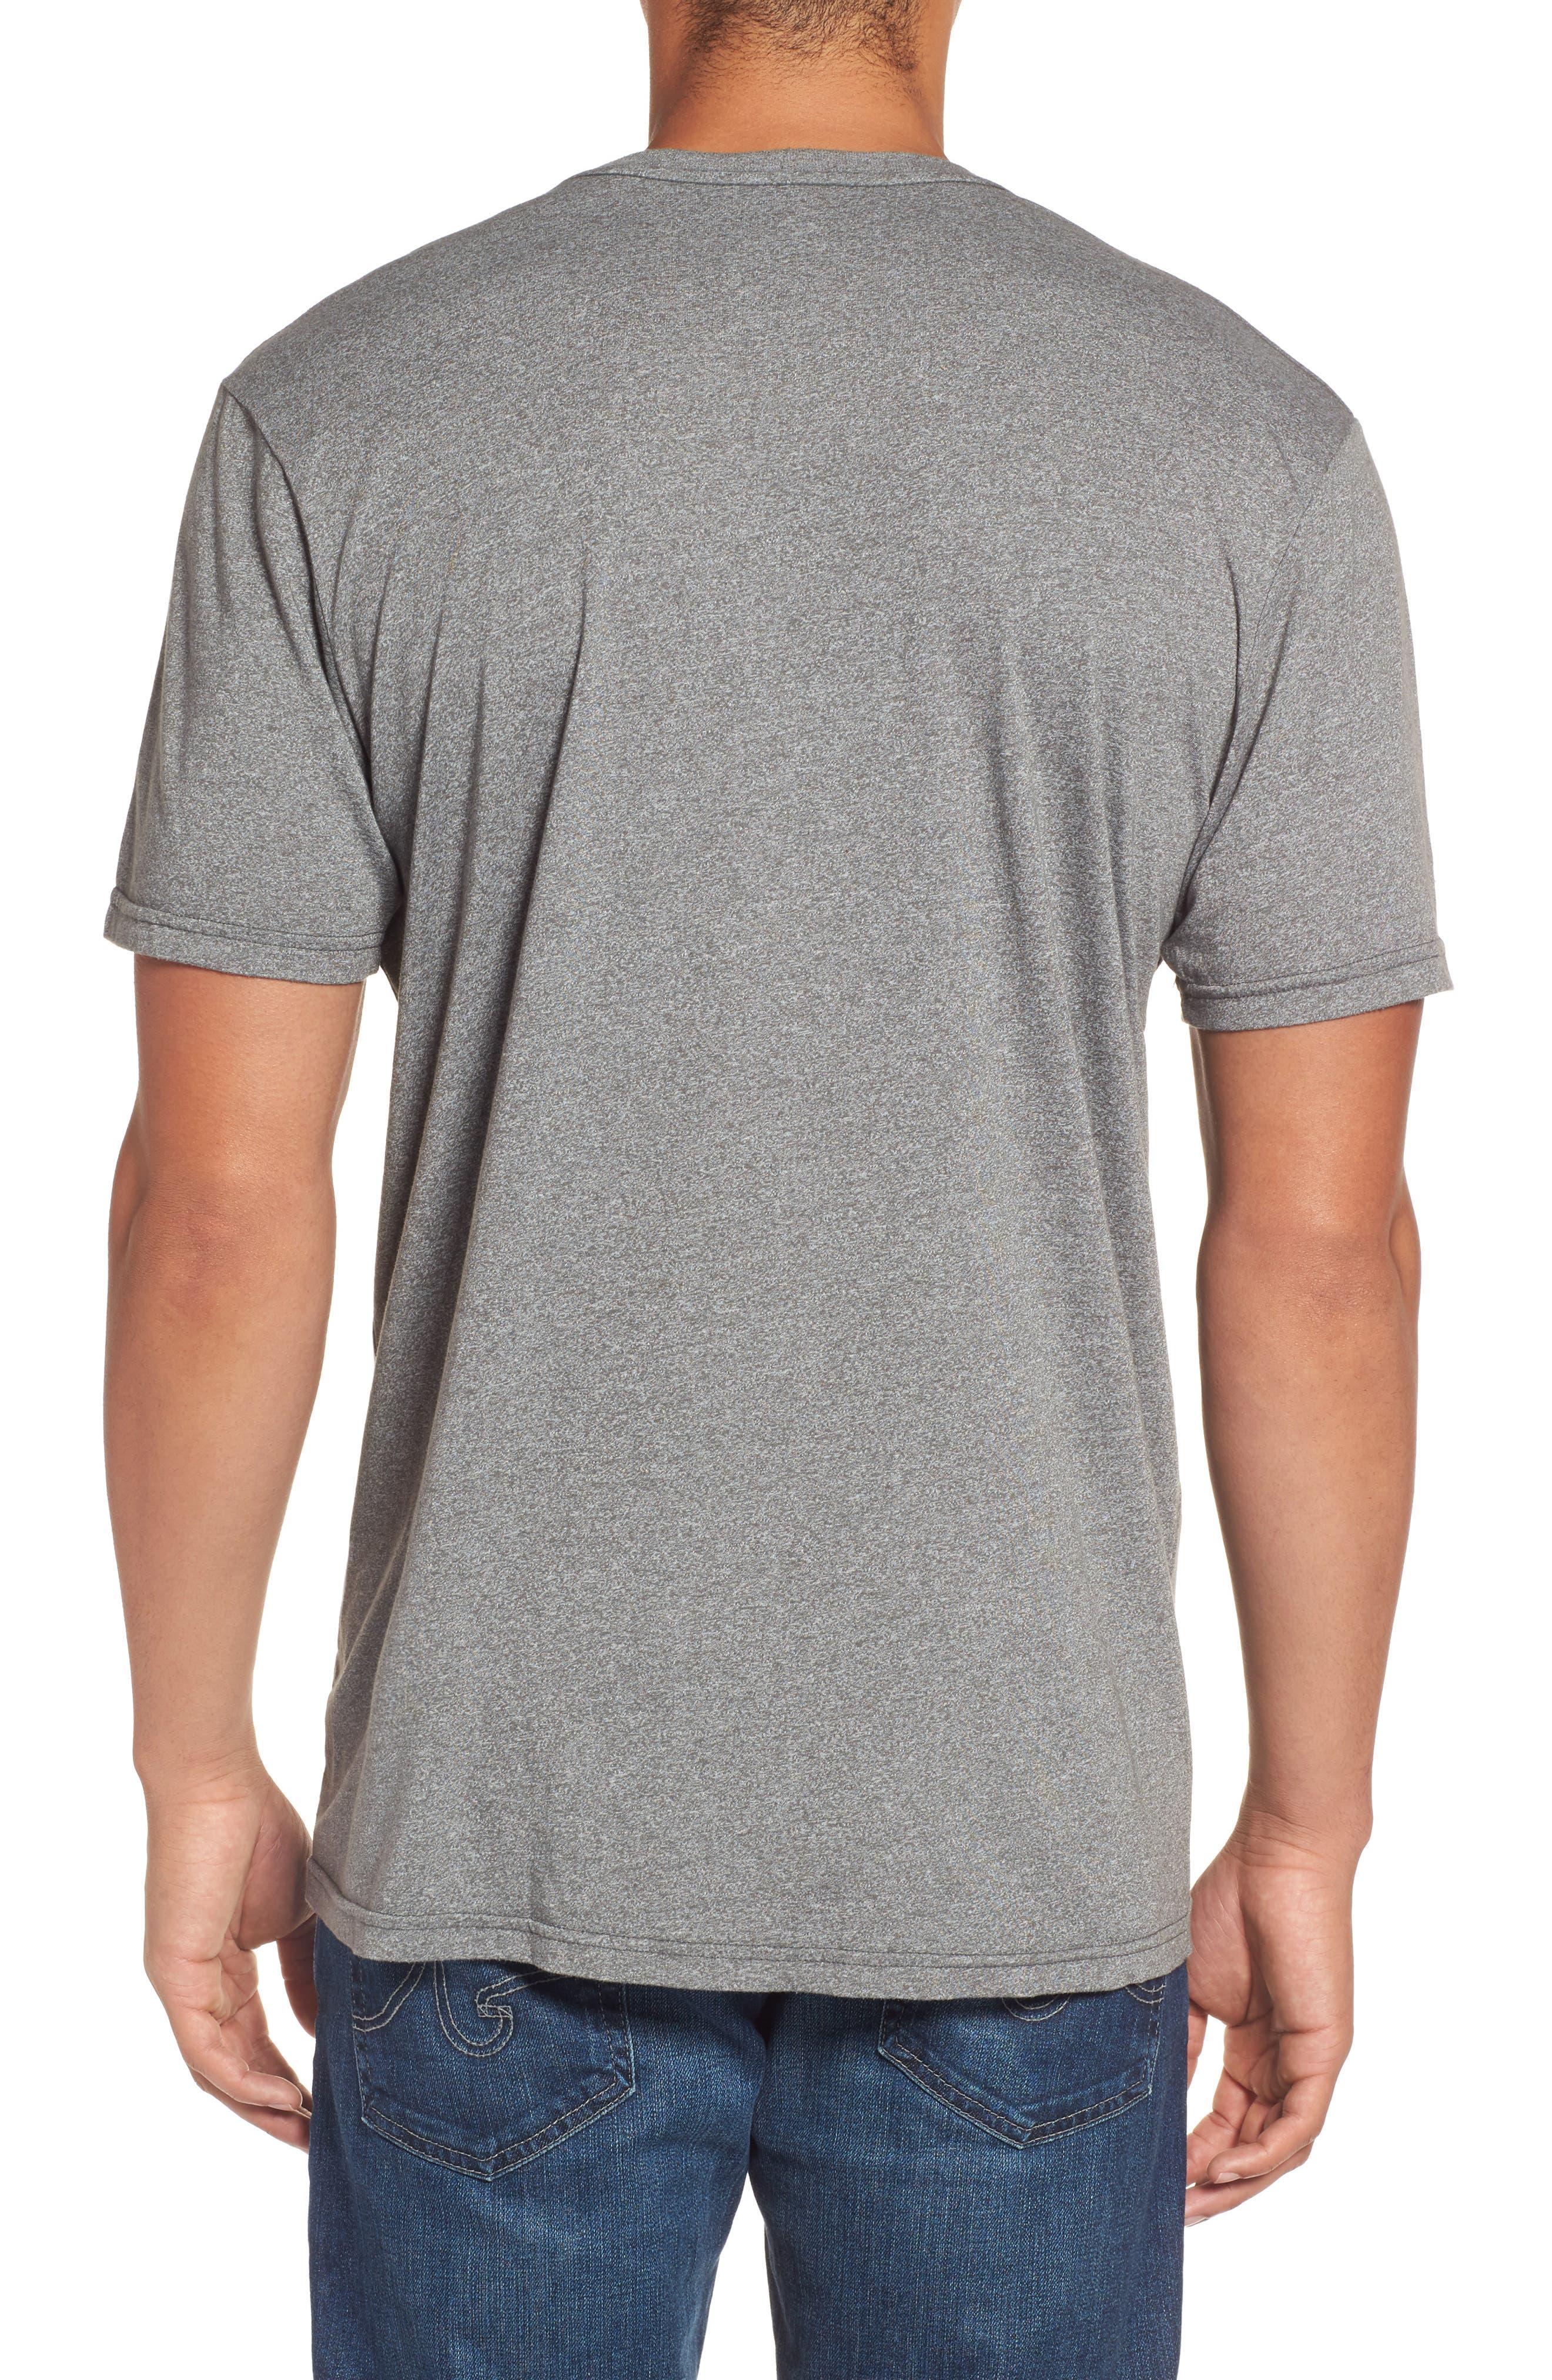 Alternate Image 2  - Rip Curl Era Mock Twist Logo Graphic T-Shirt